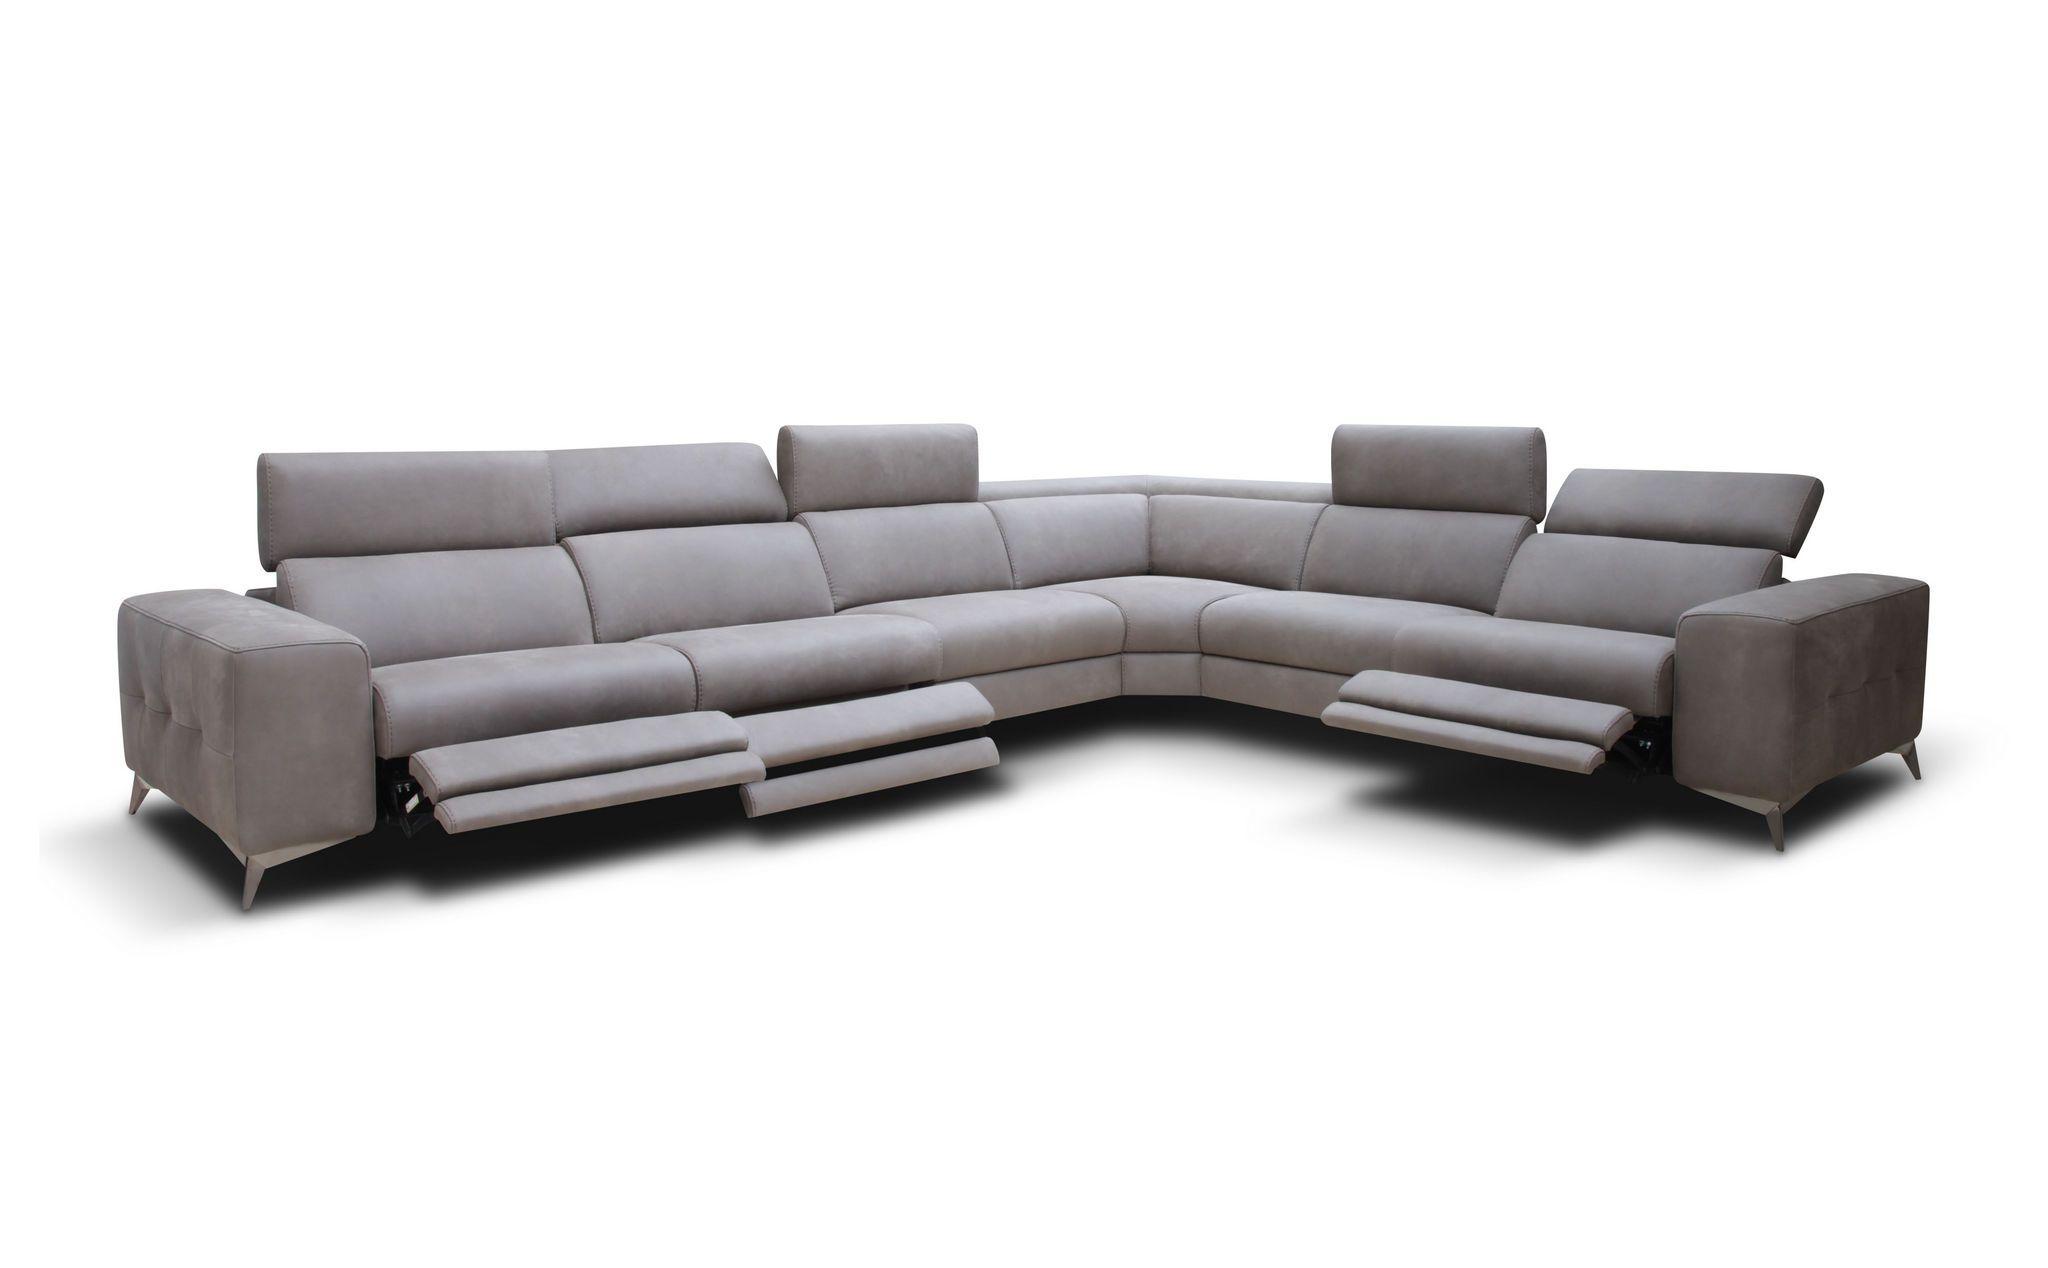 Tessa Sectional Braccisofas Com Sectional Sofa With Recliner